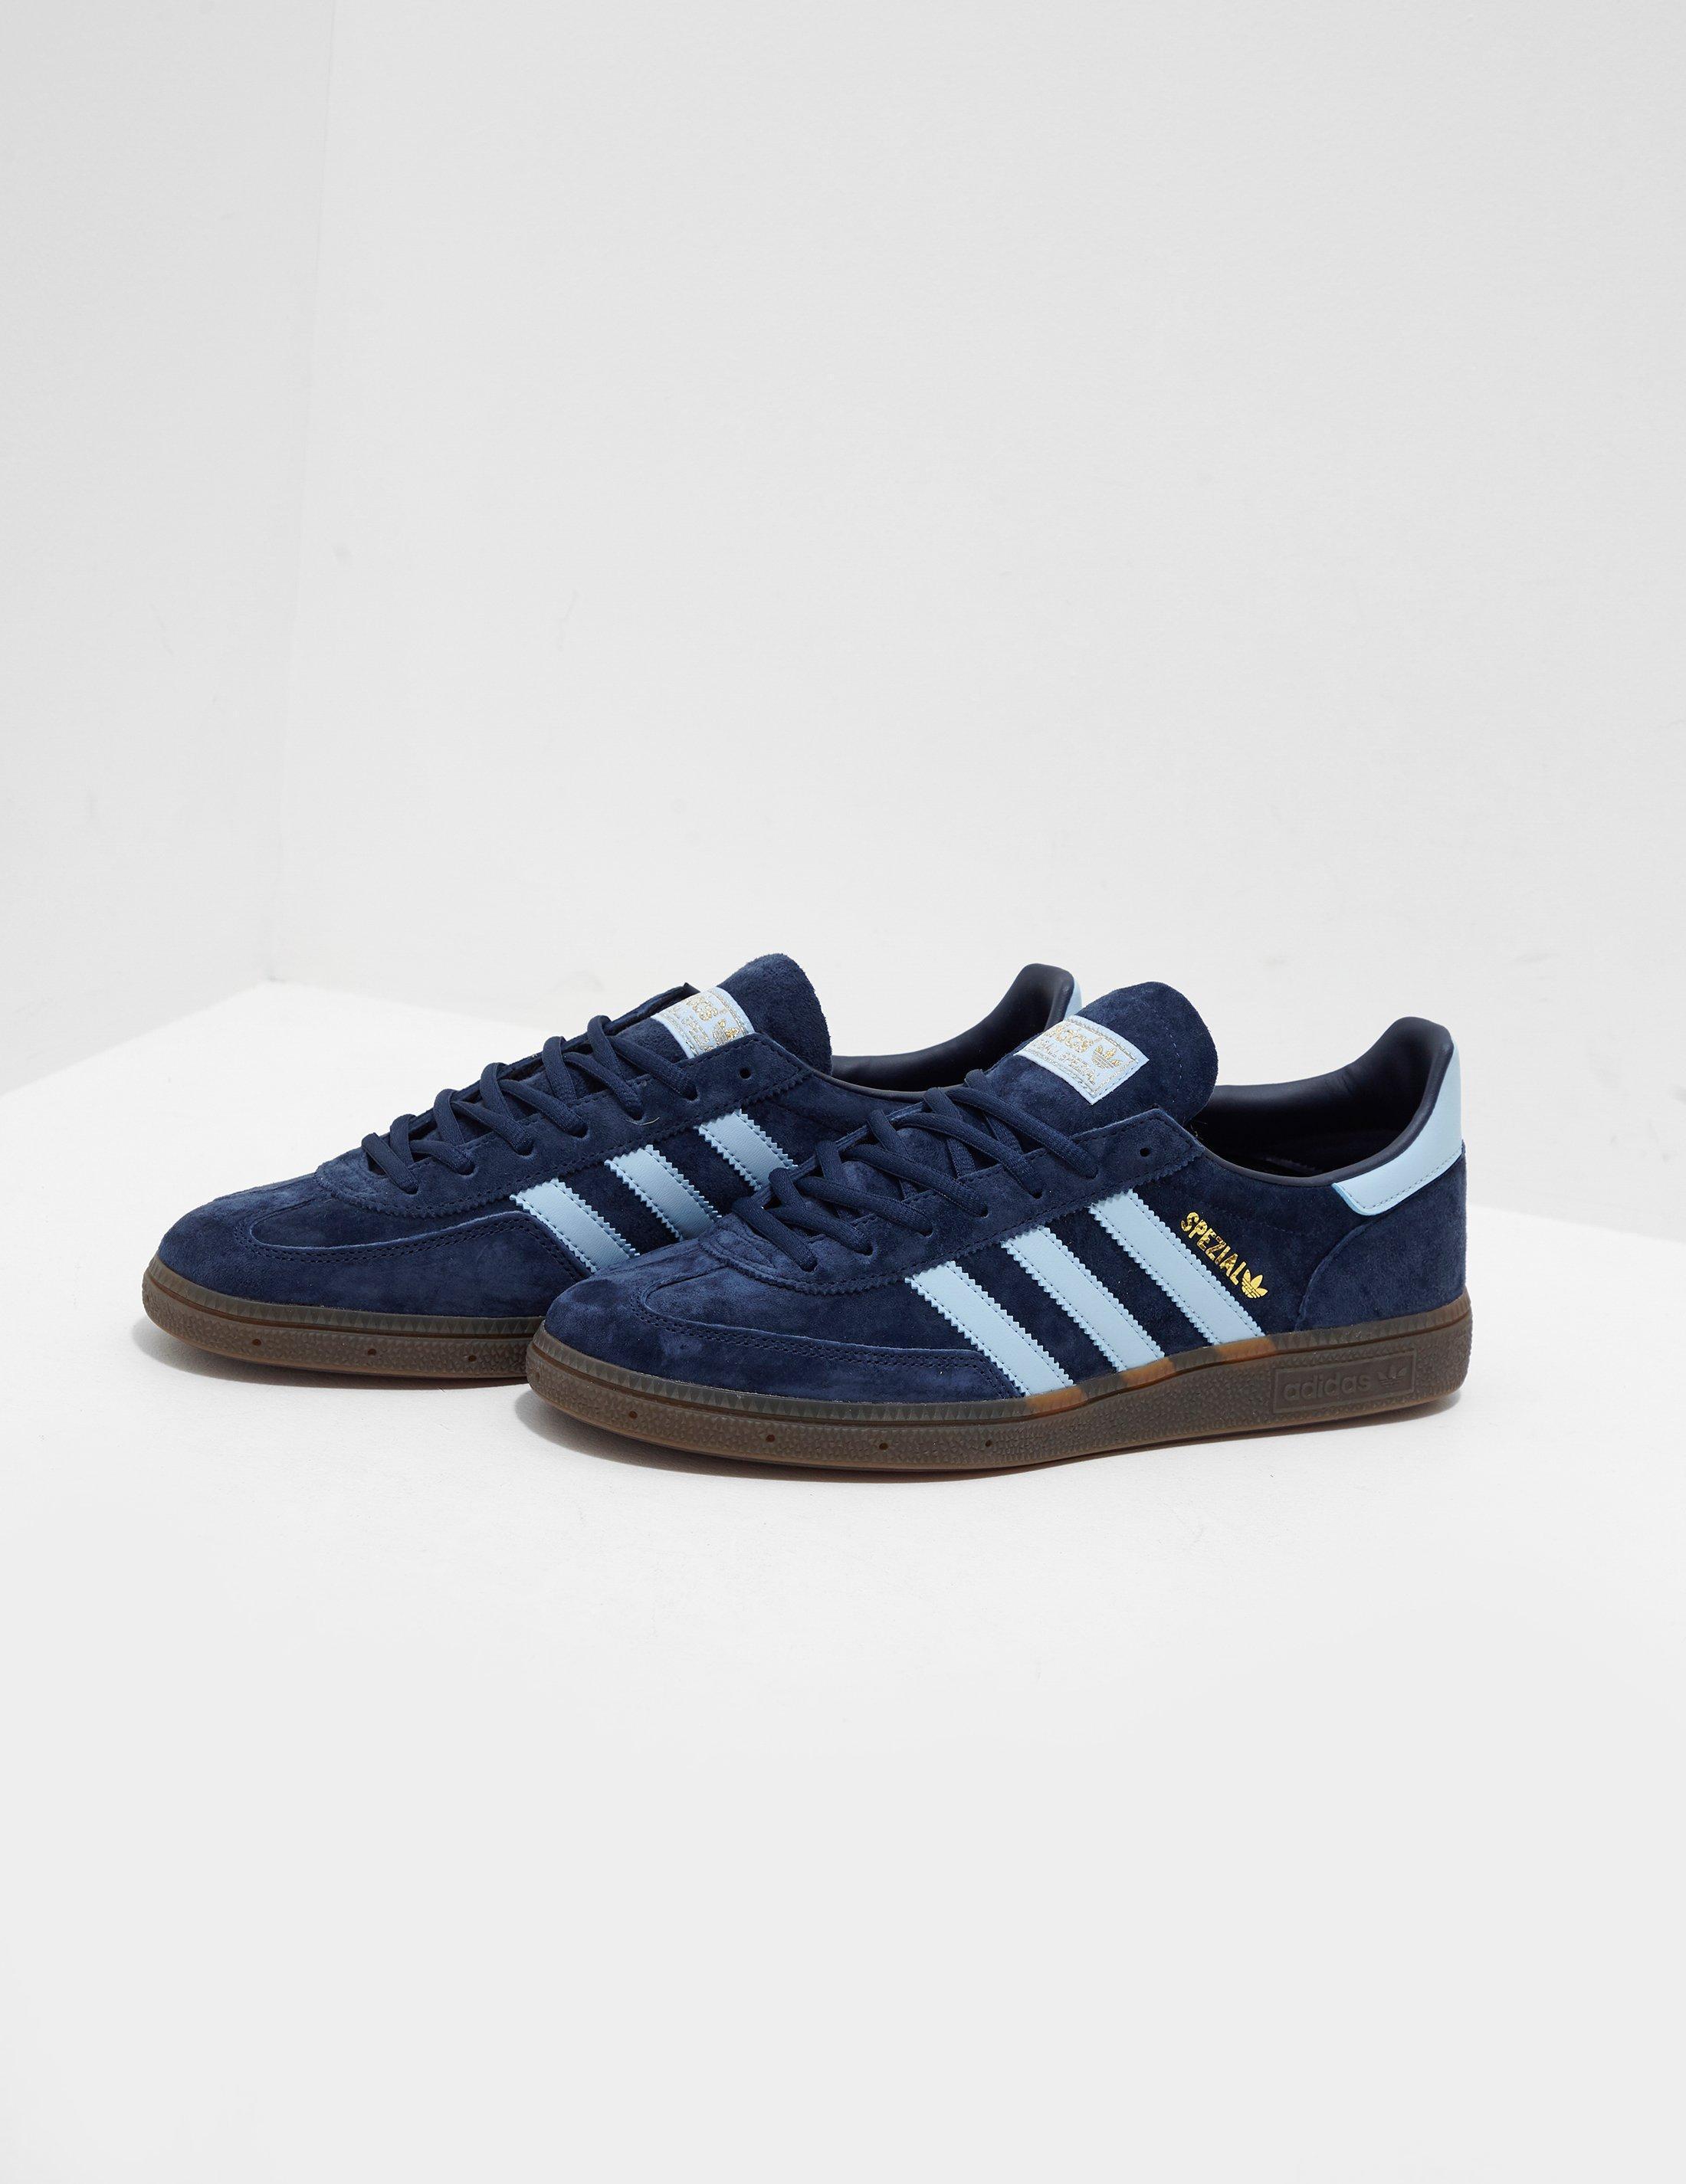 on sale 11825 94c15 Adidas Originals - Handball Spezial Navy Blue for Men - Lyst. View  fullscreen